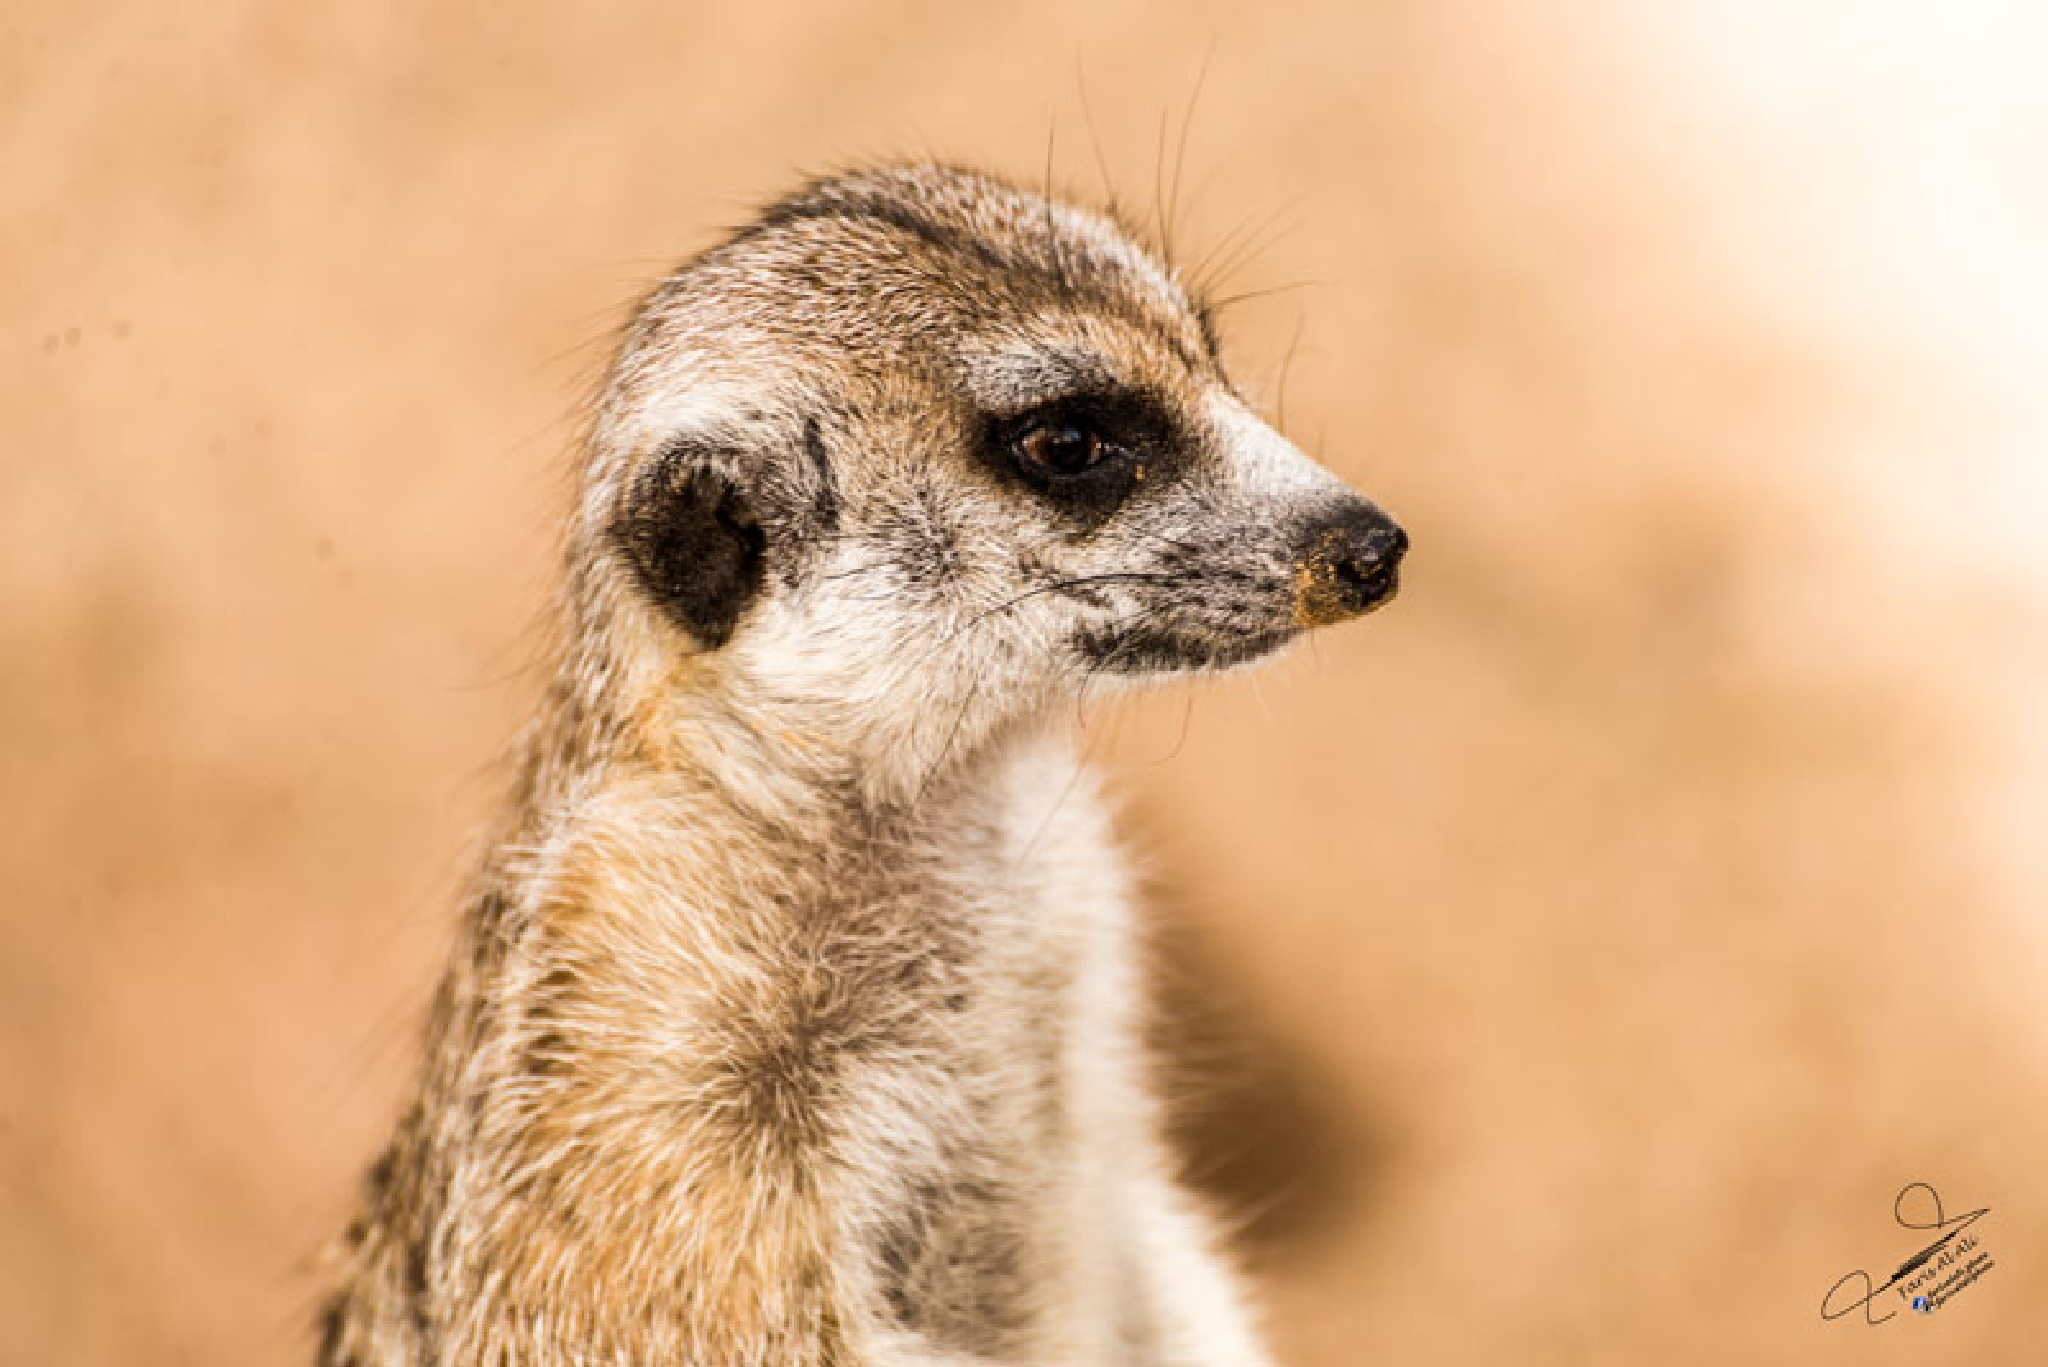 Animal Photography by farisalali.photo